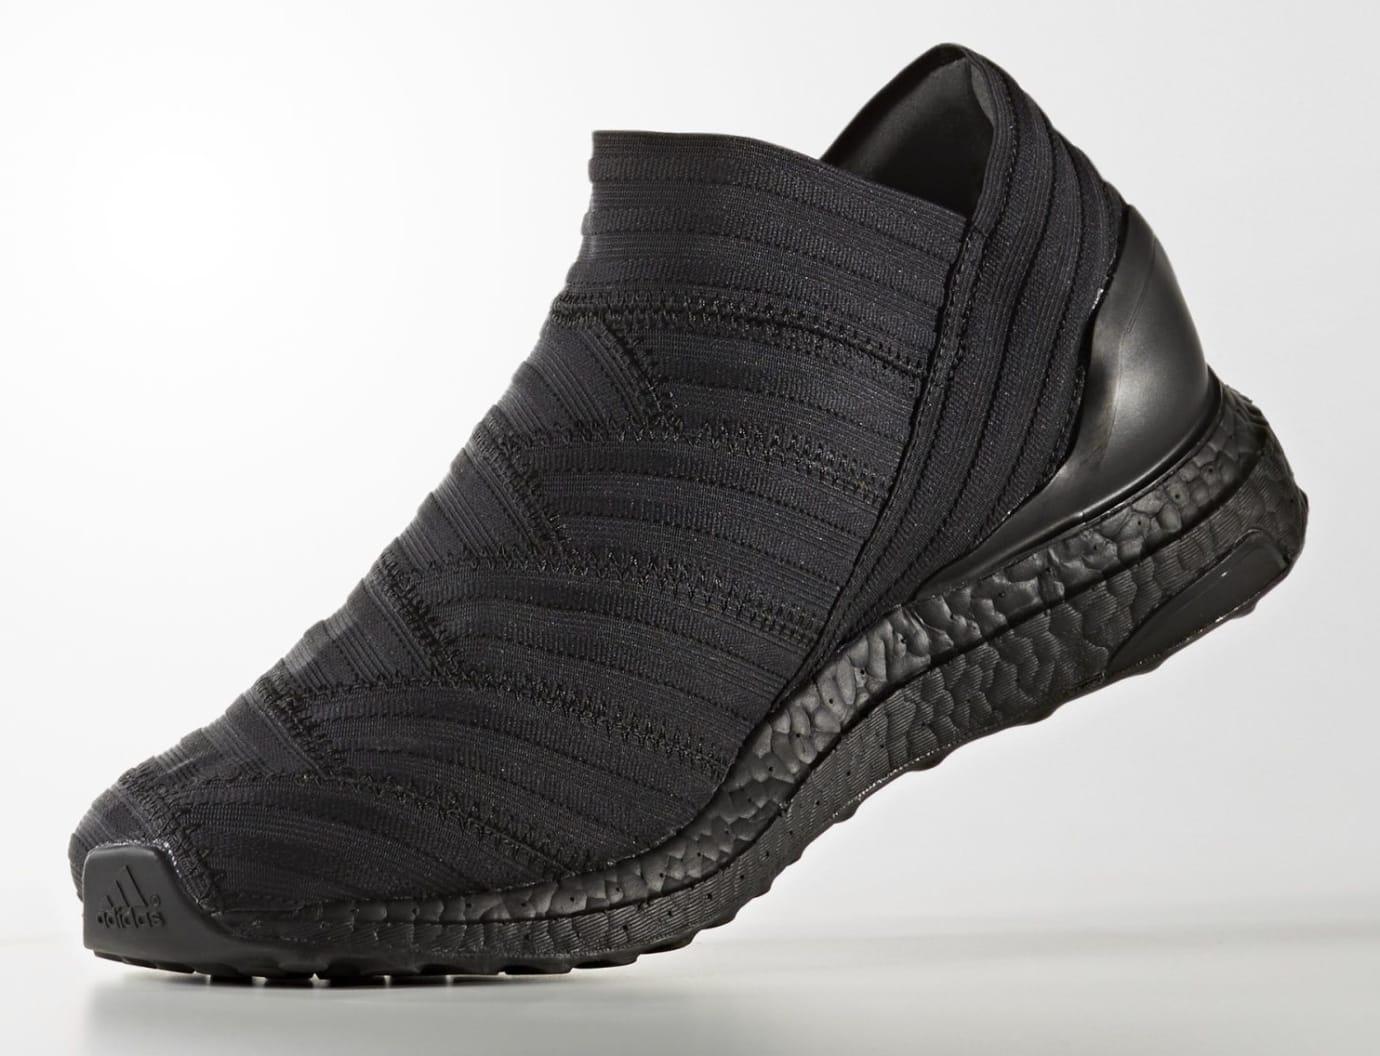 Adidas Nemeziz Tango 17+ 360 Agility 'Triple Black' CG3657 (Medial)